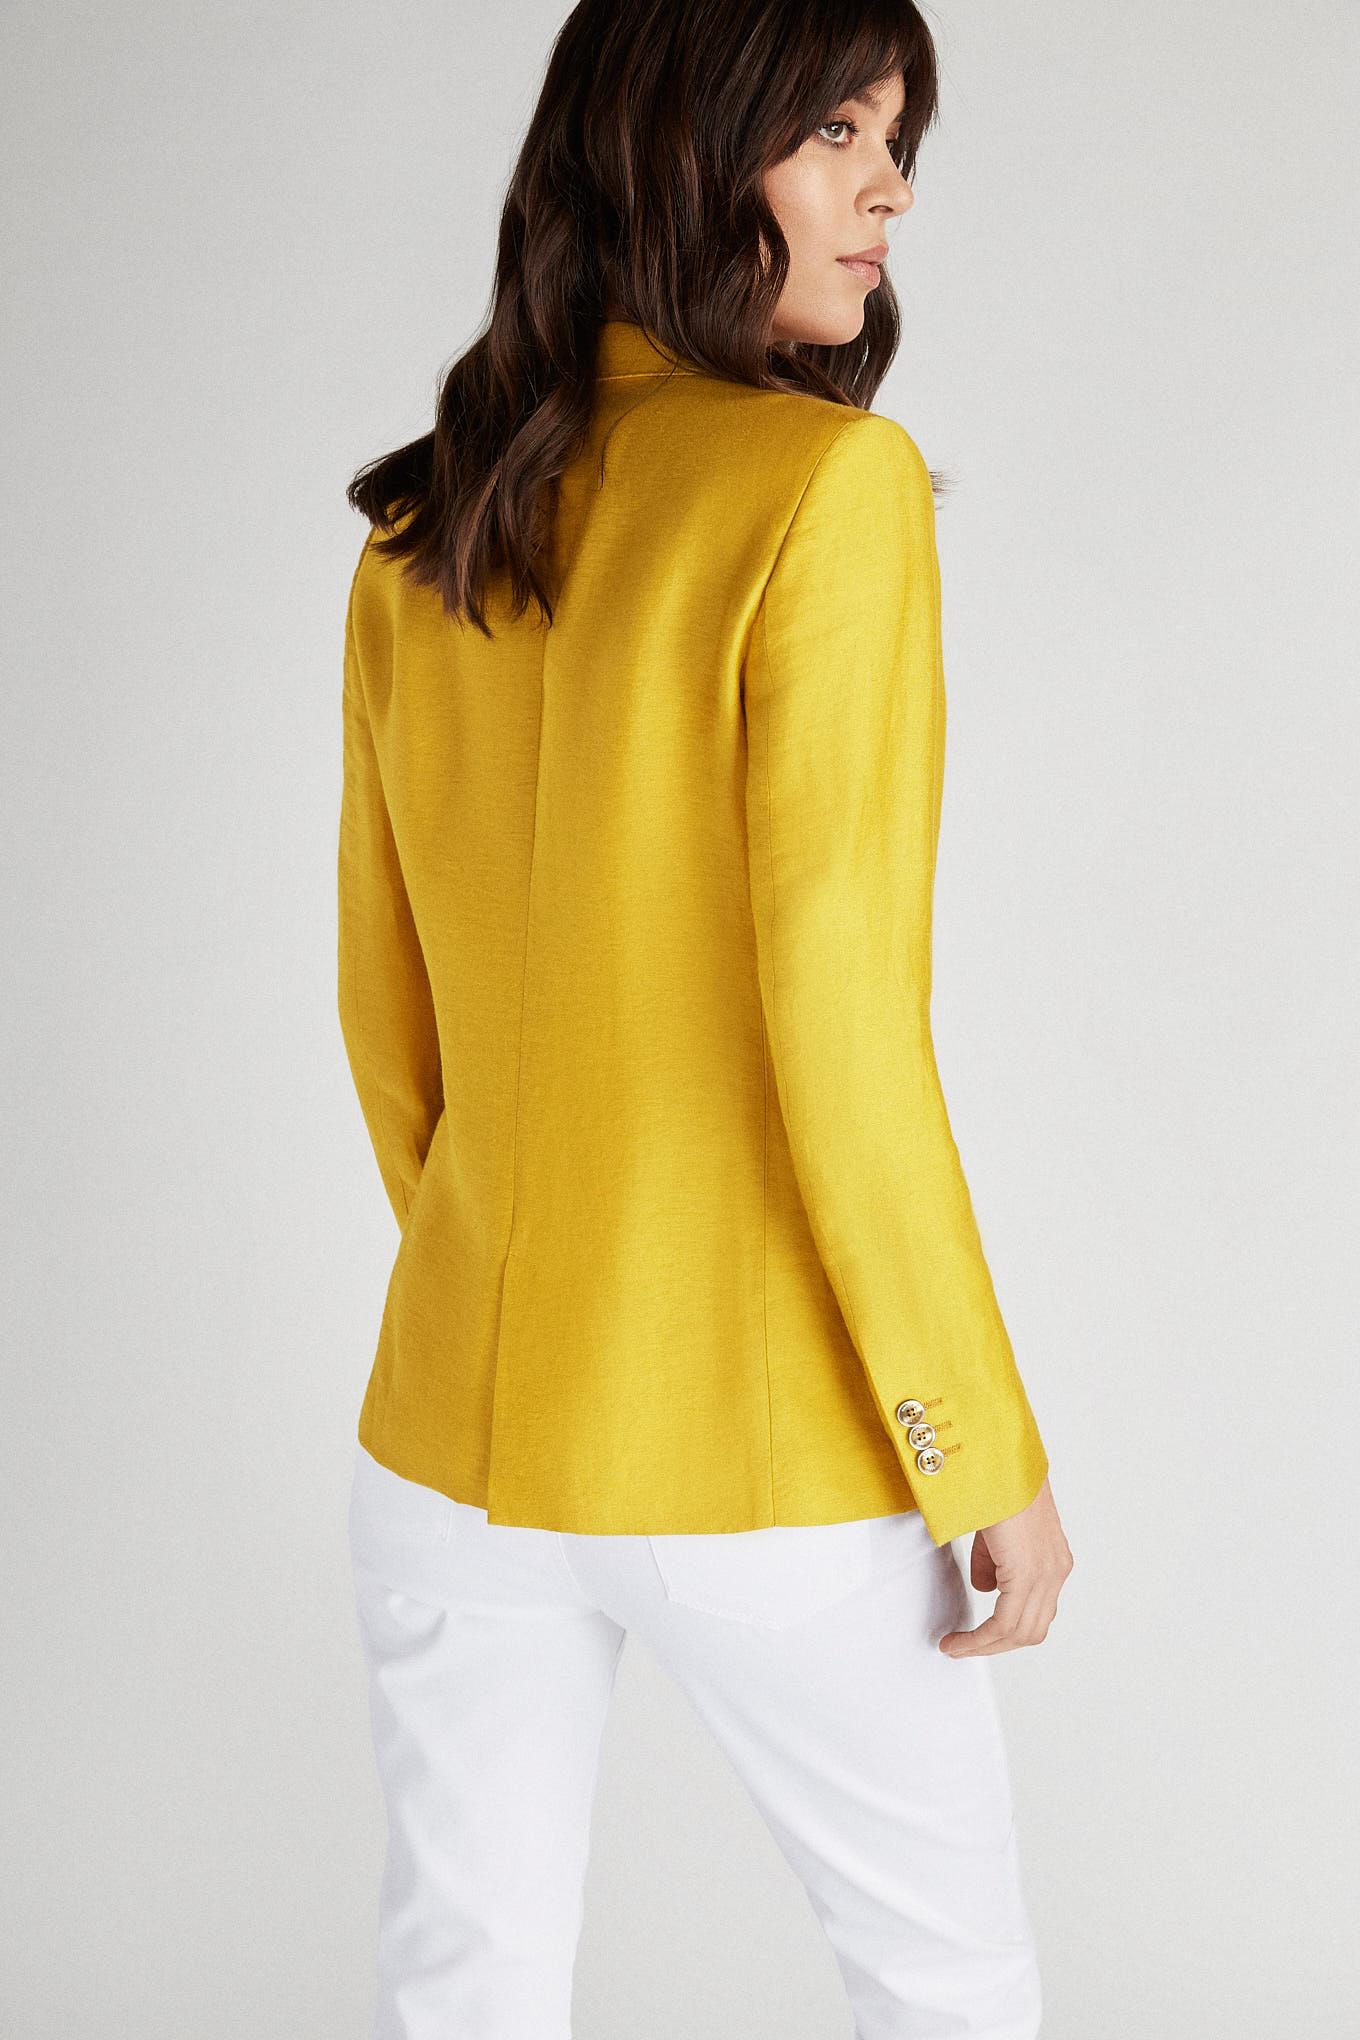 Blazer Amarelo Classic Mulher